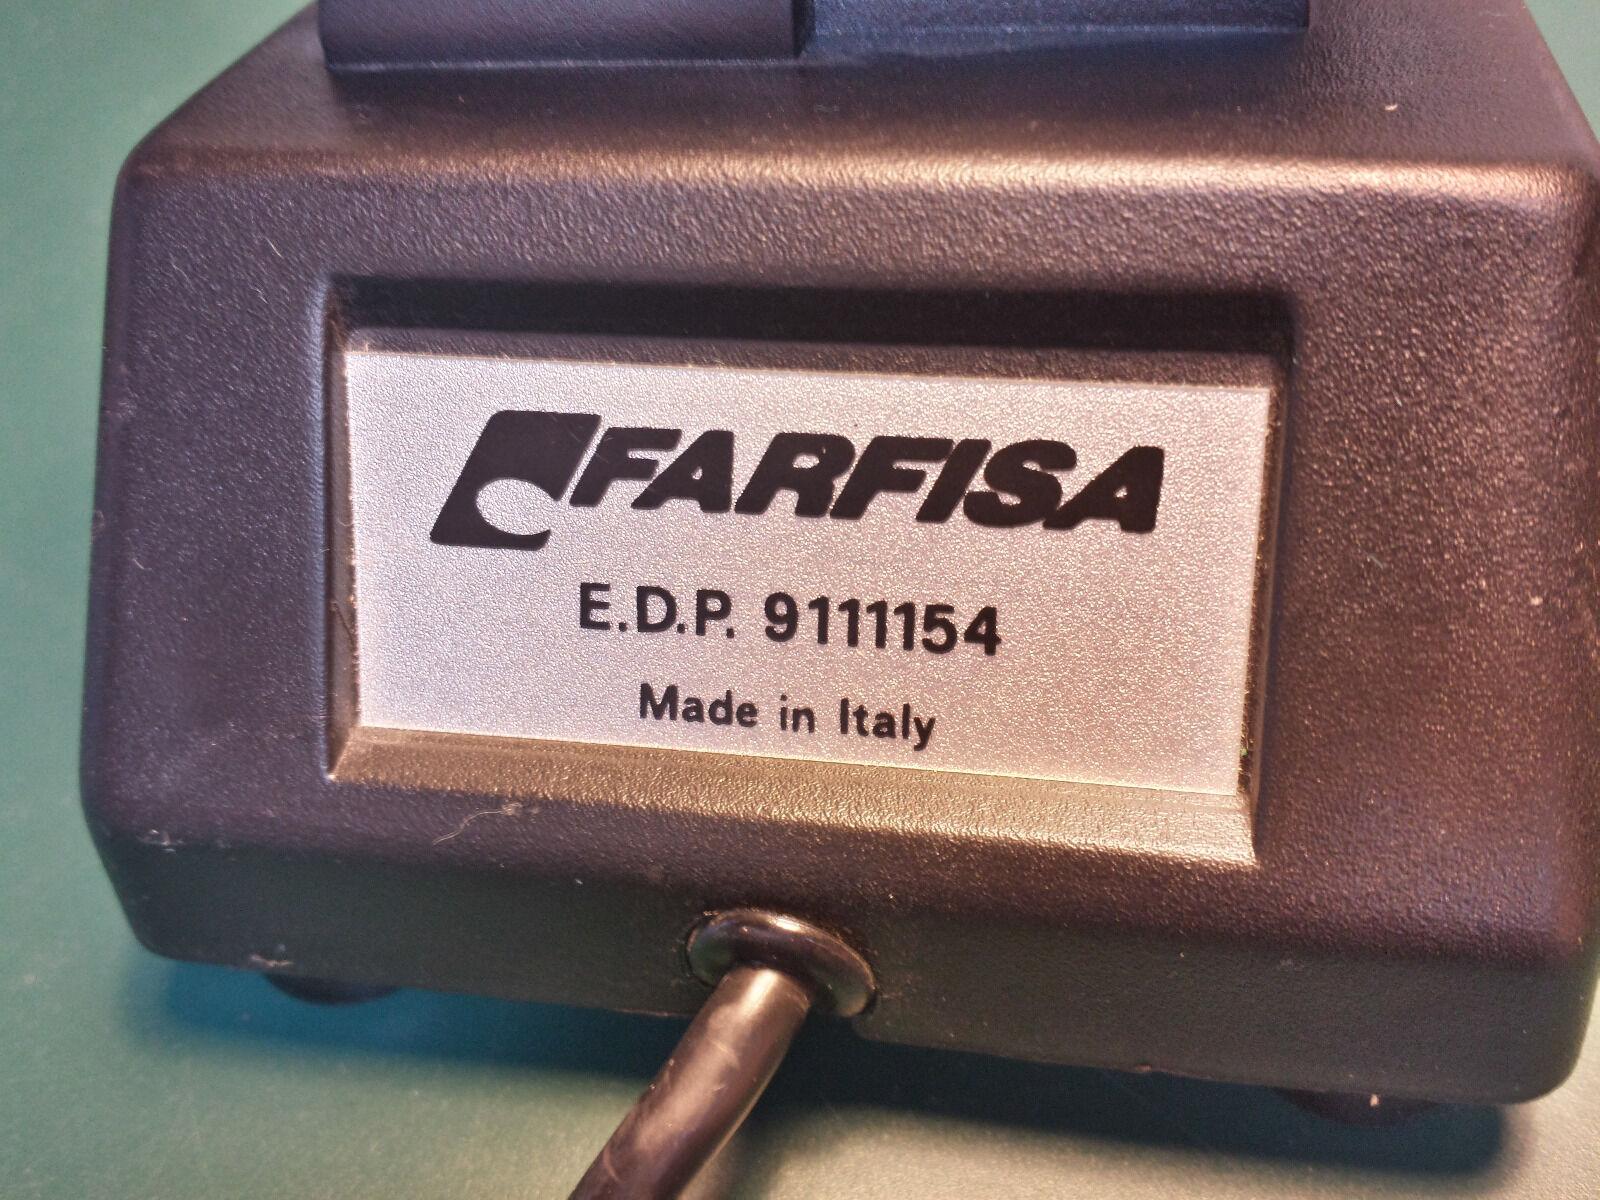 040 - Farfisa Pedal zur Lautstärkeverstellung - 6,3mm Klinke - 040